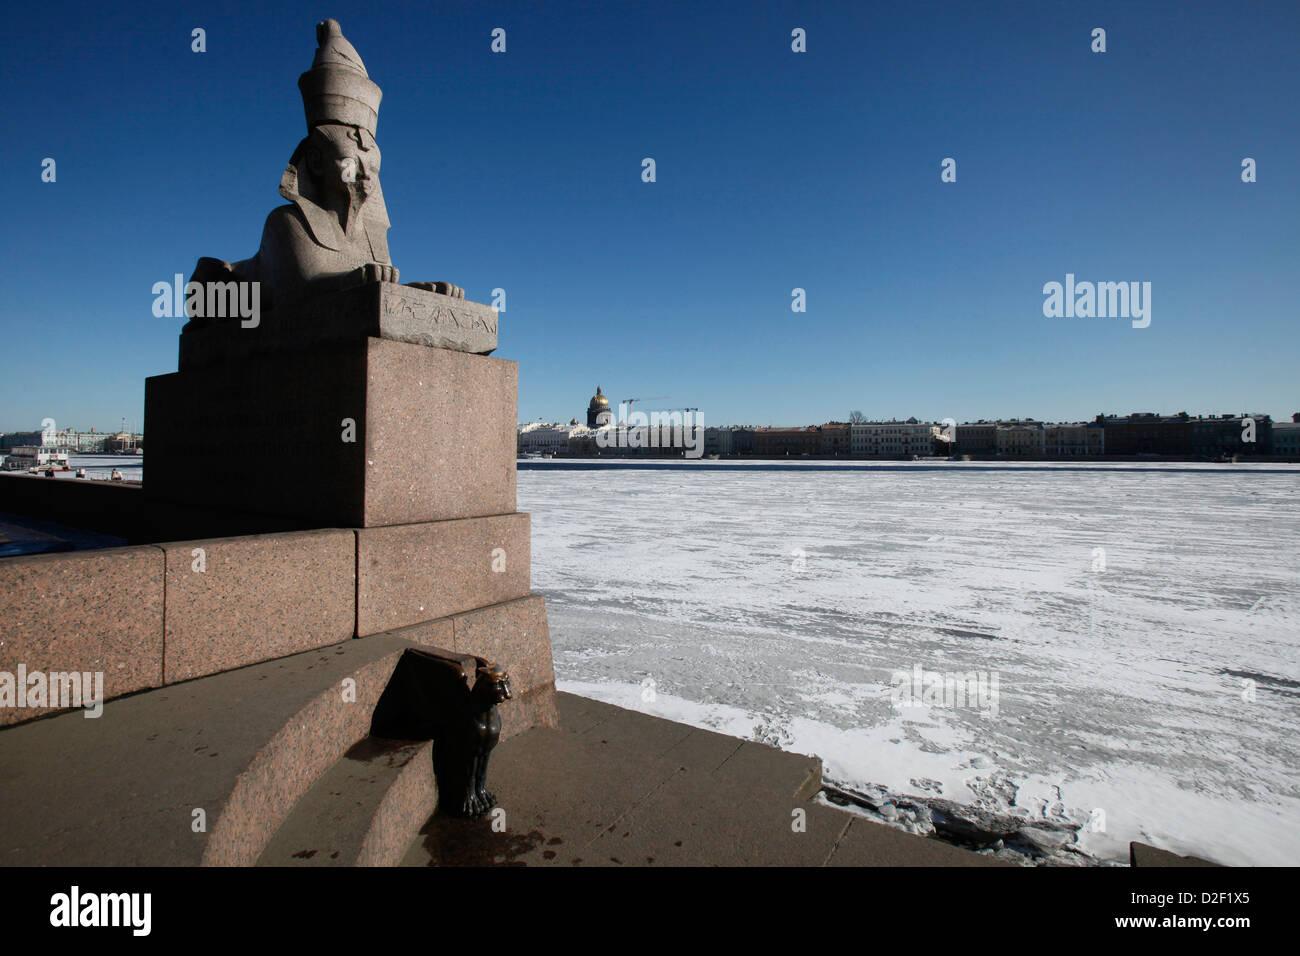 Sphinx statue on bank of Neva river. Saint Petersburg. Russia. - Stock Image